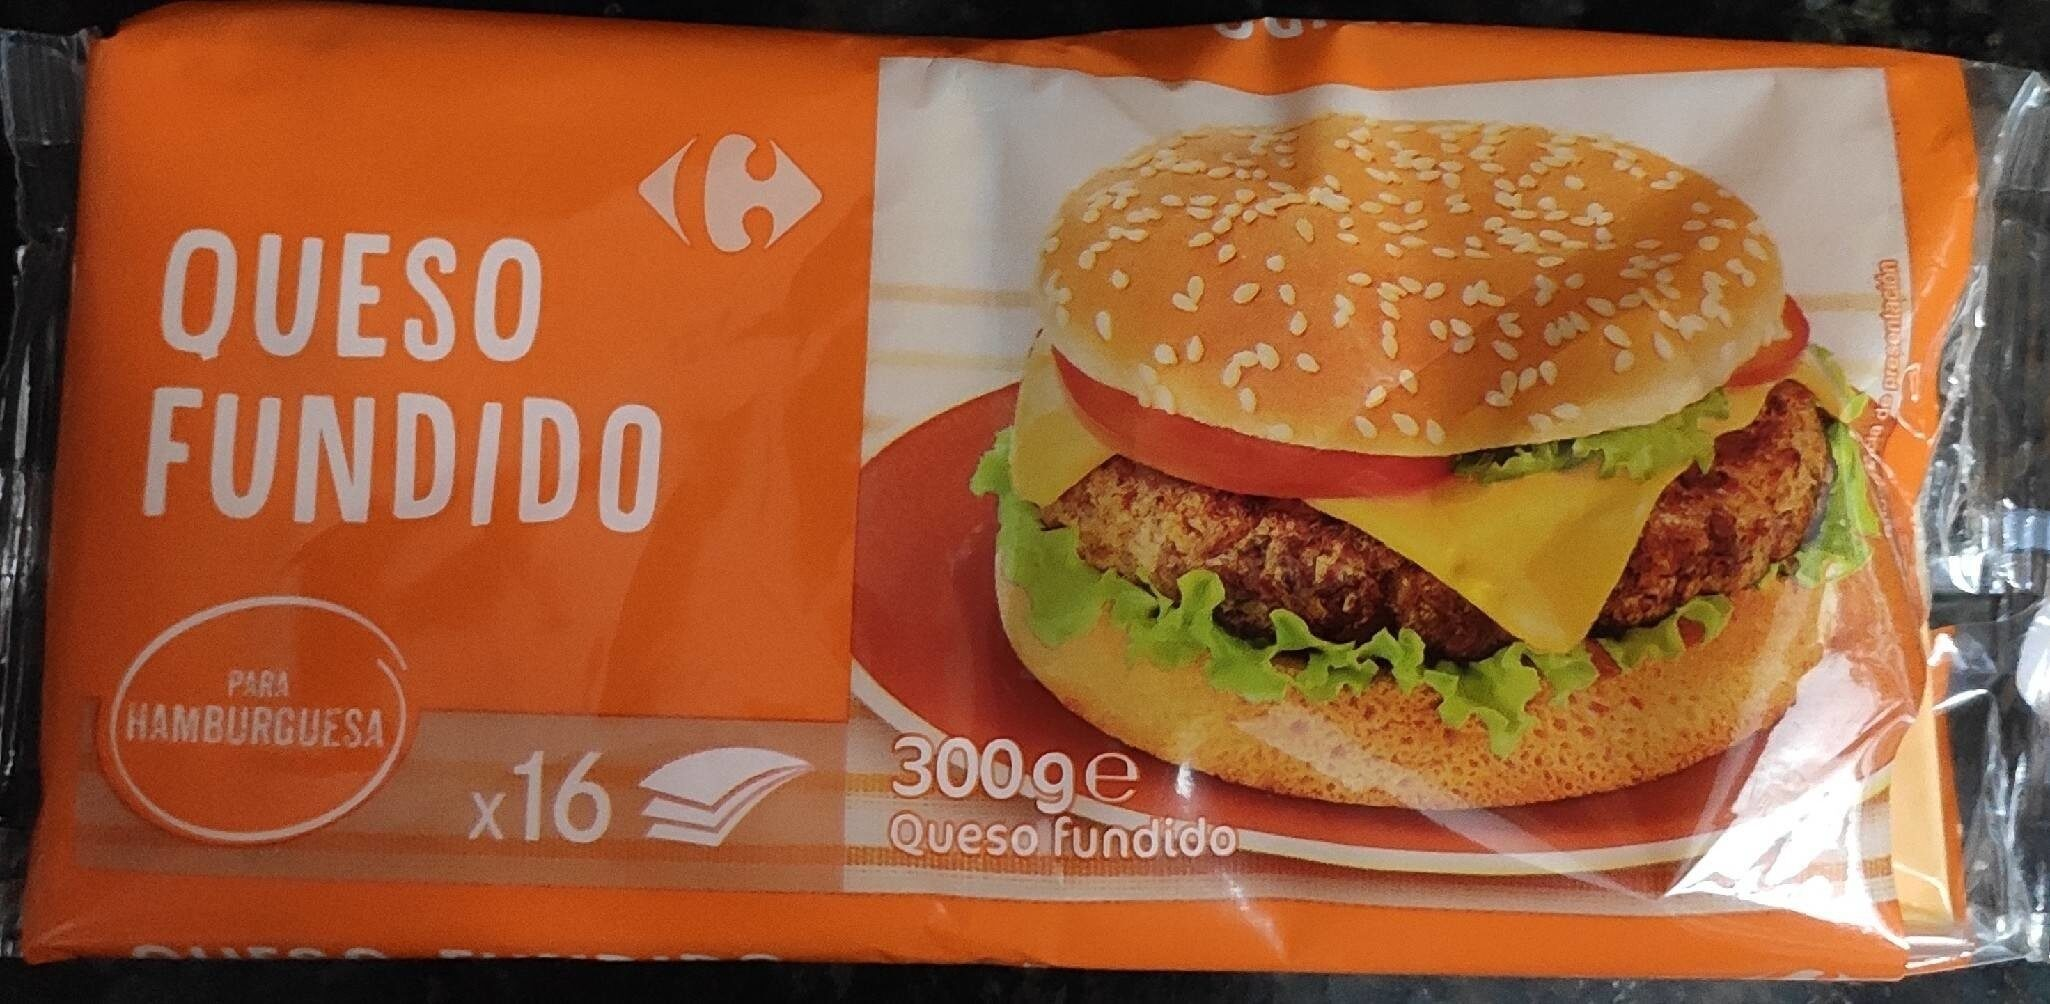 Queso fundido para hamburguesa (Carrefour) - Producte